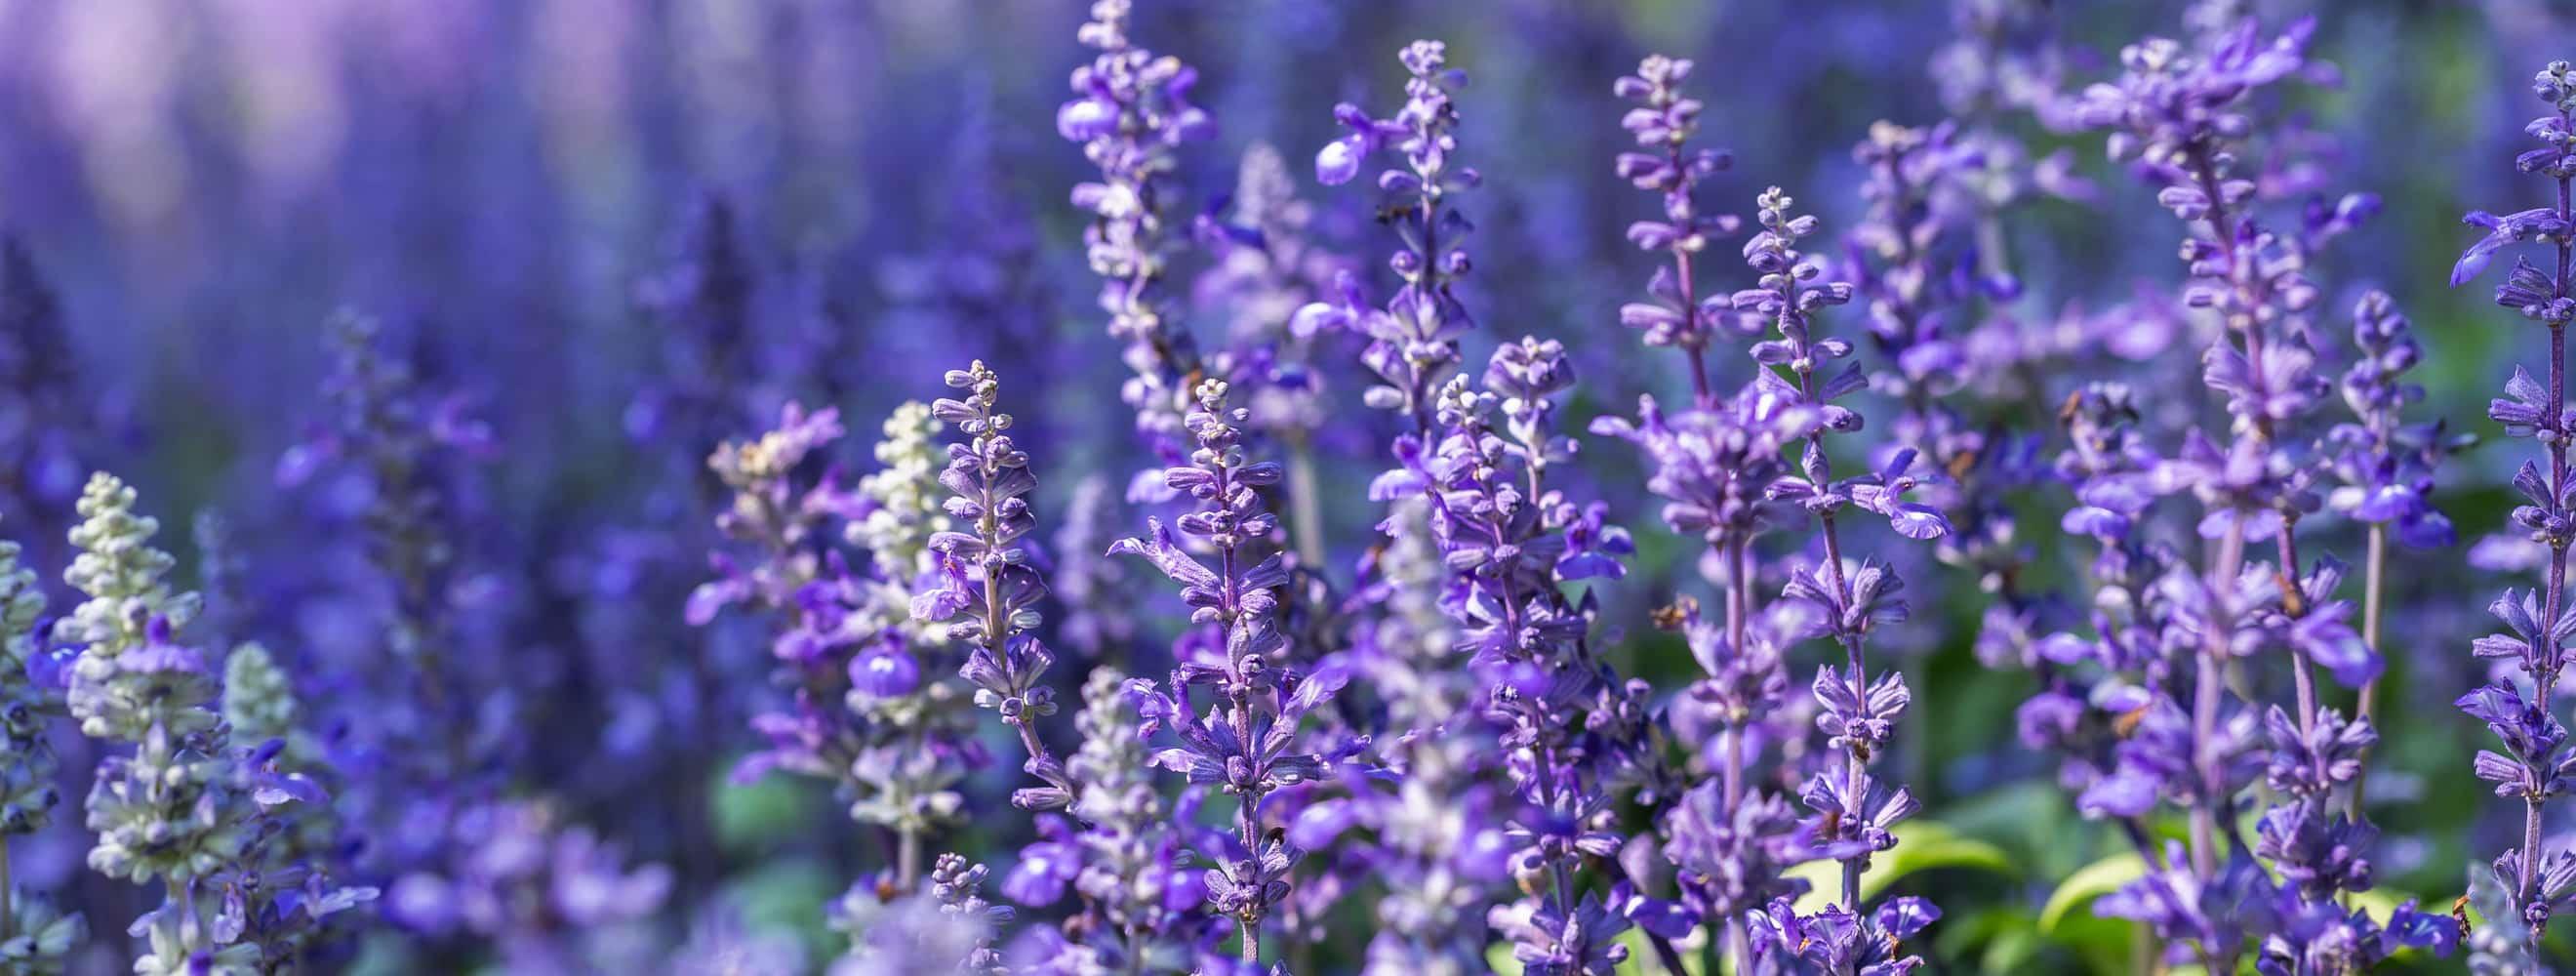 Small purple spring flowers in bloom